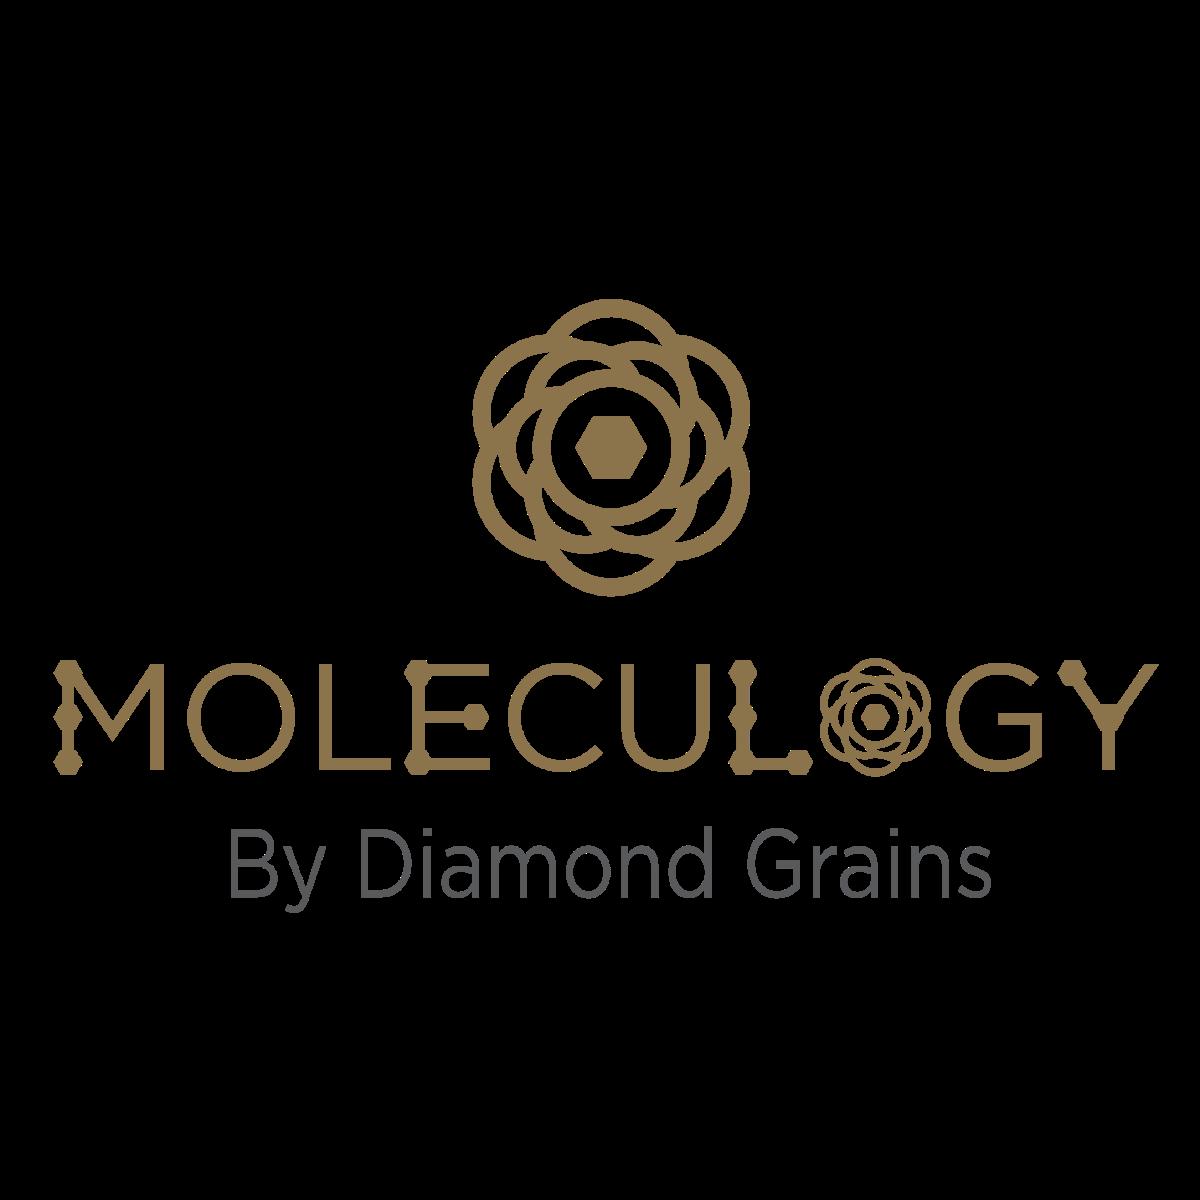 LOGO_MOLECULOGY-01